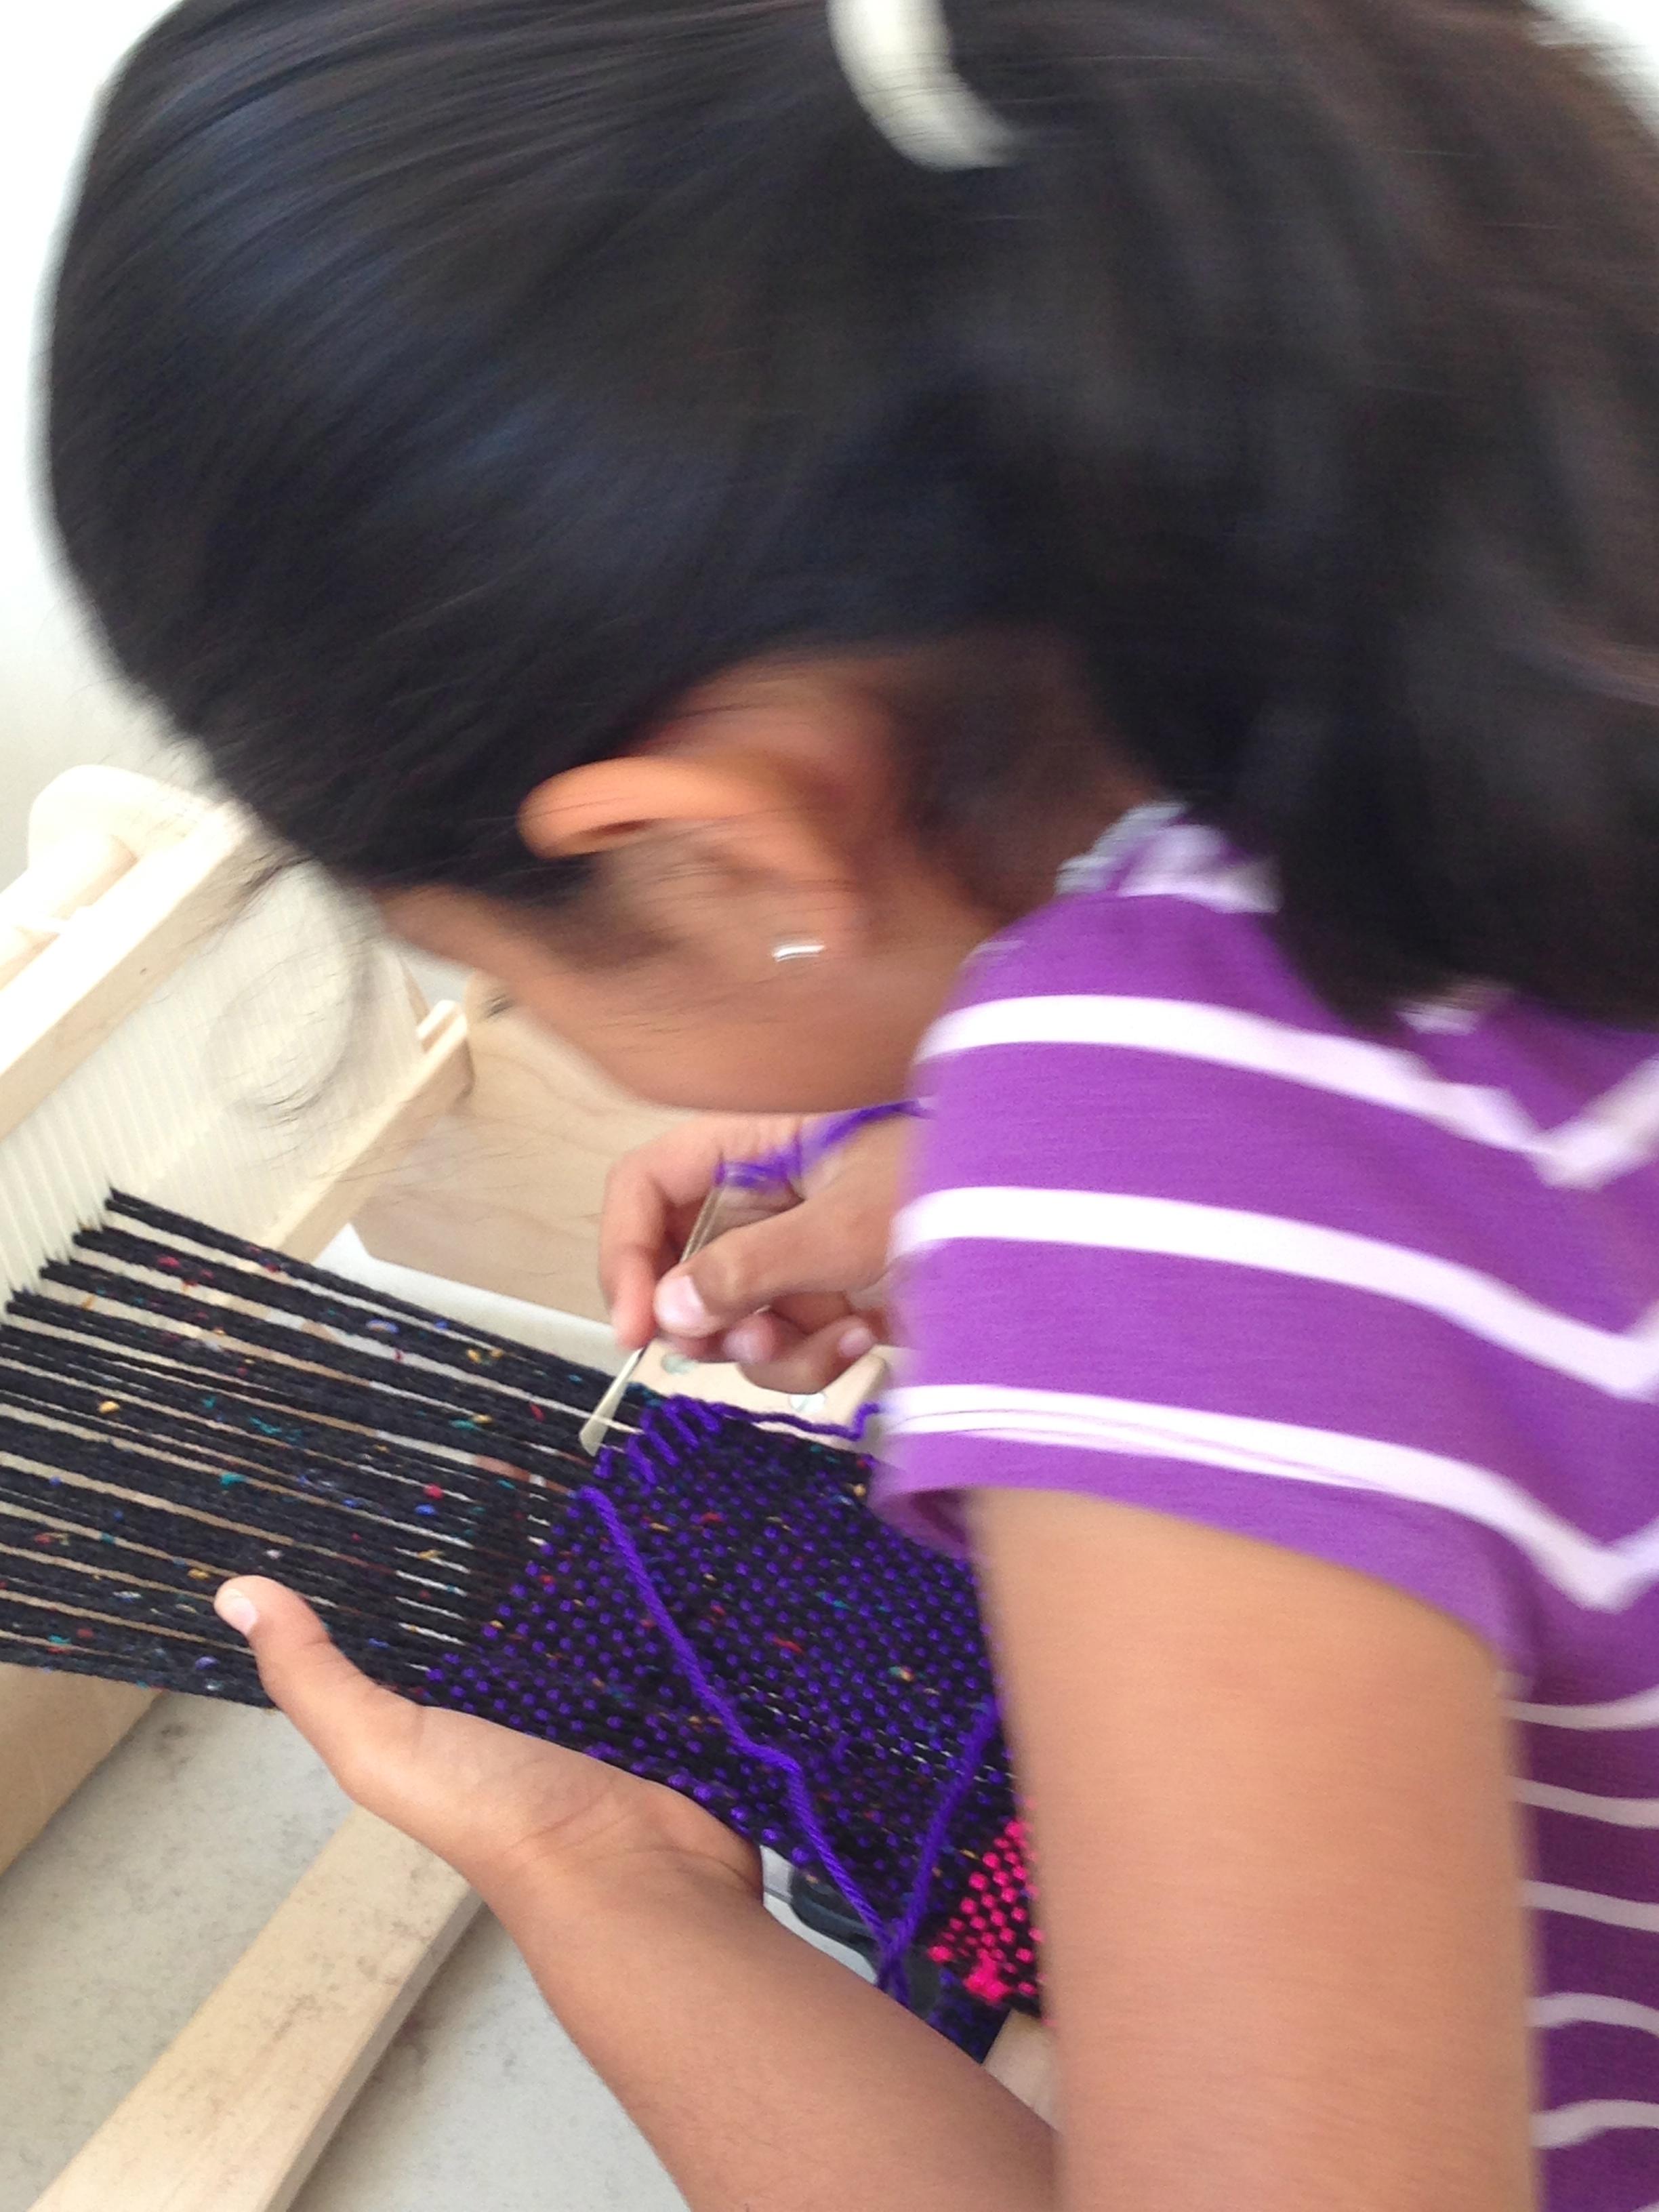 3rd grader hem stitching her scarf.